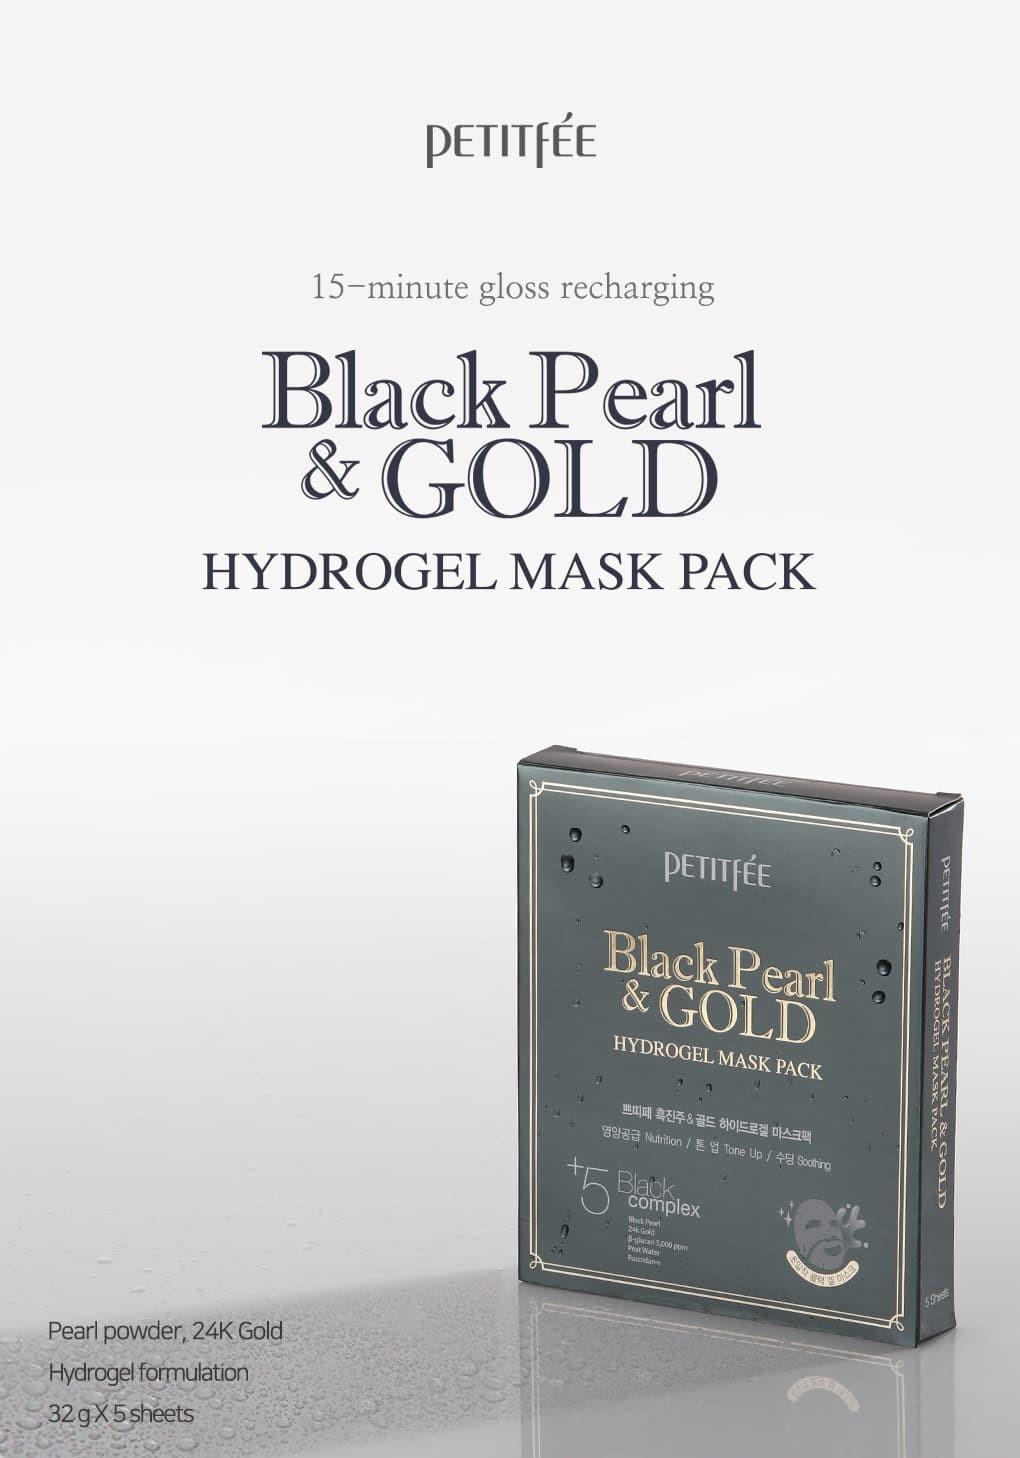 Black Pearl & Gold Hydrogel Mask-2